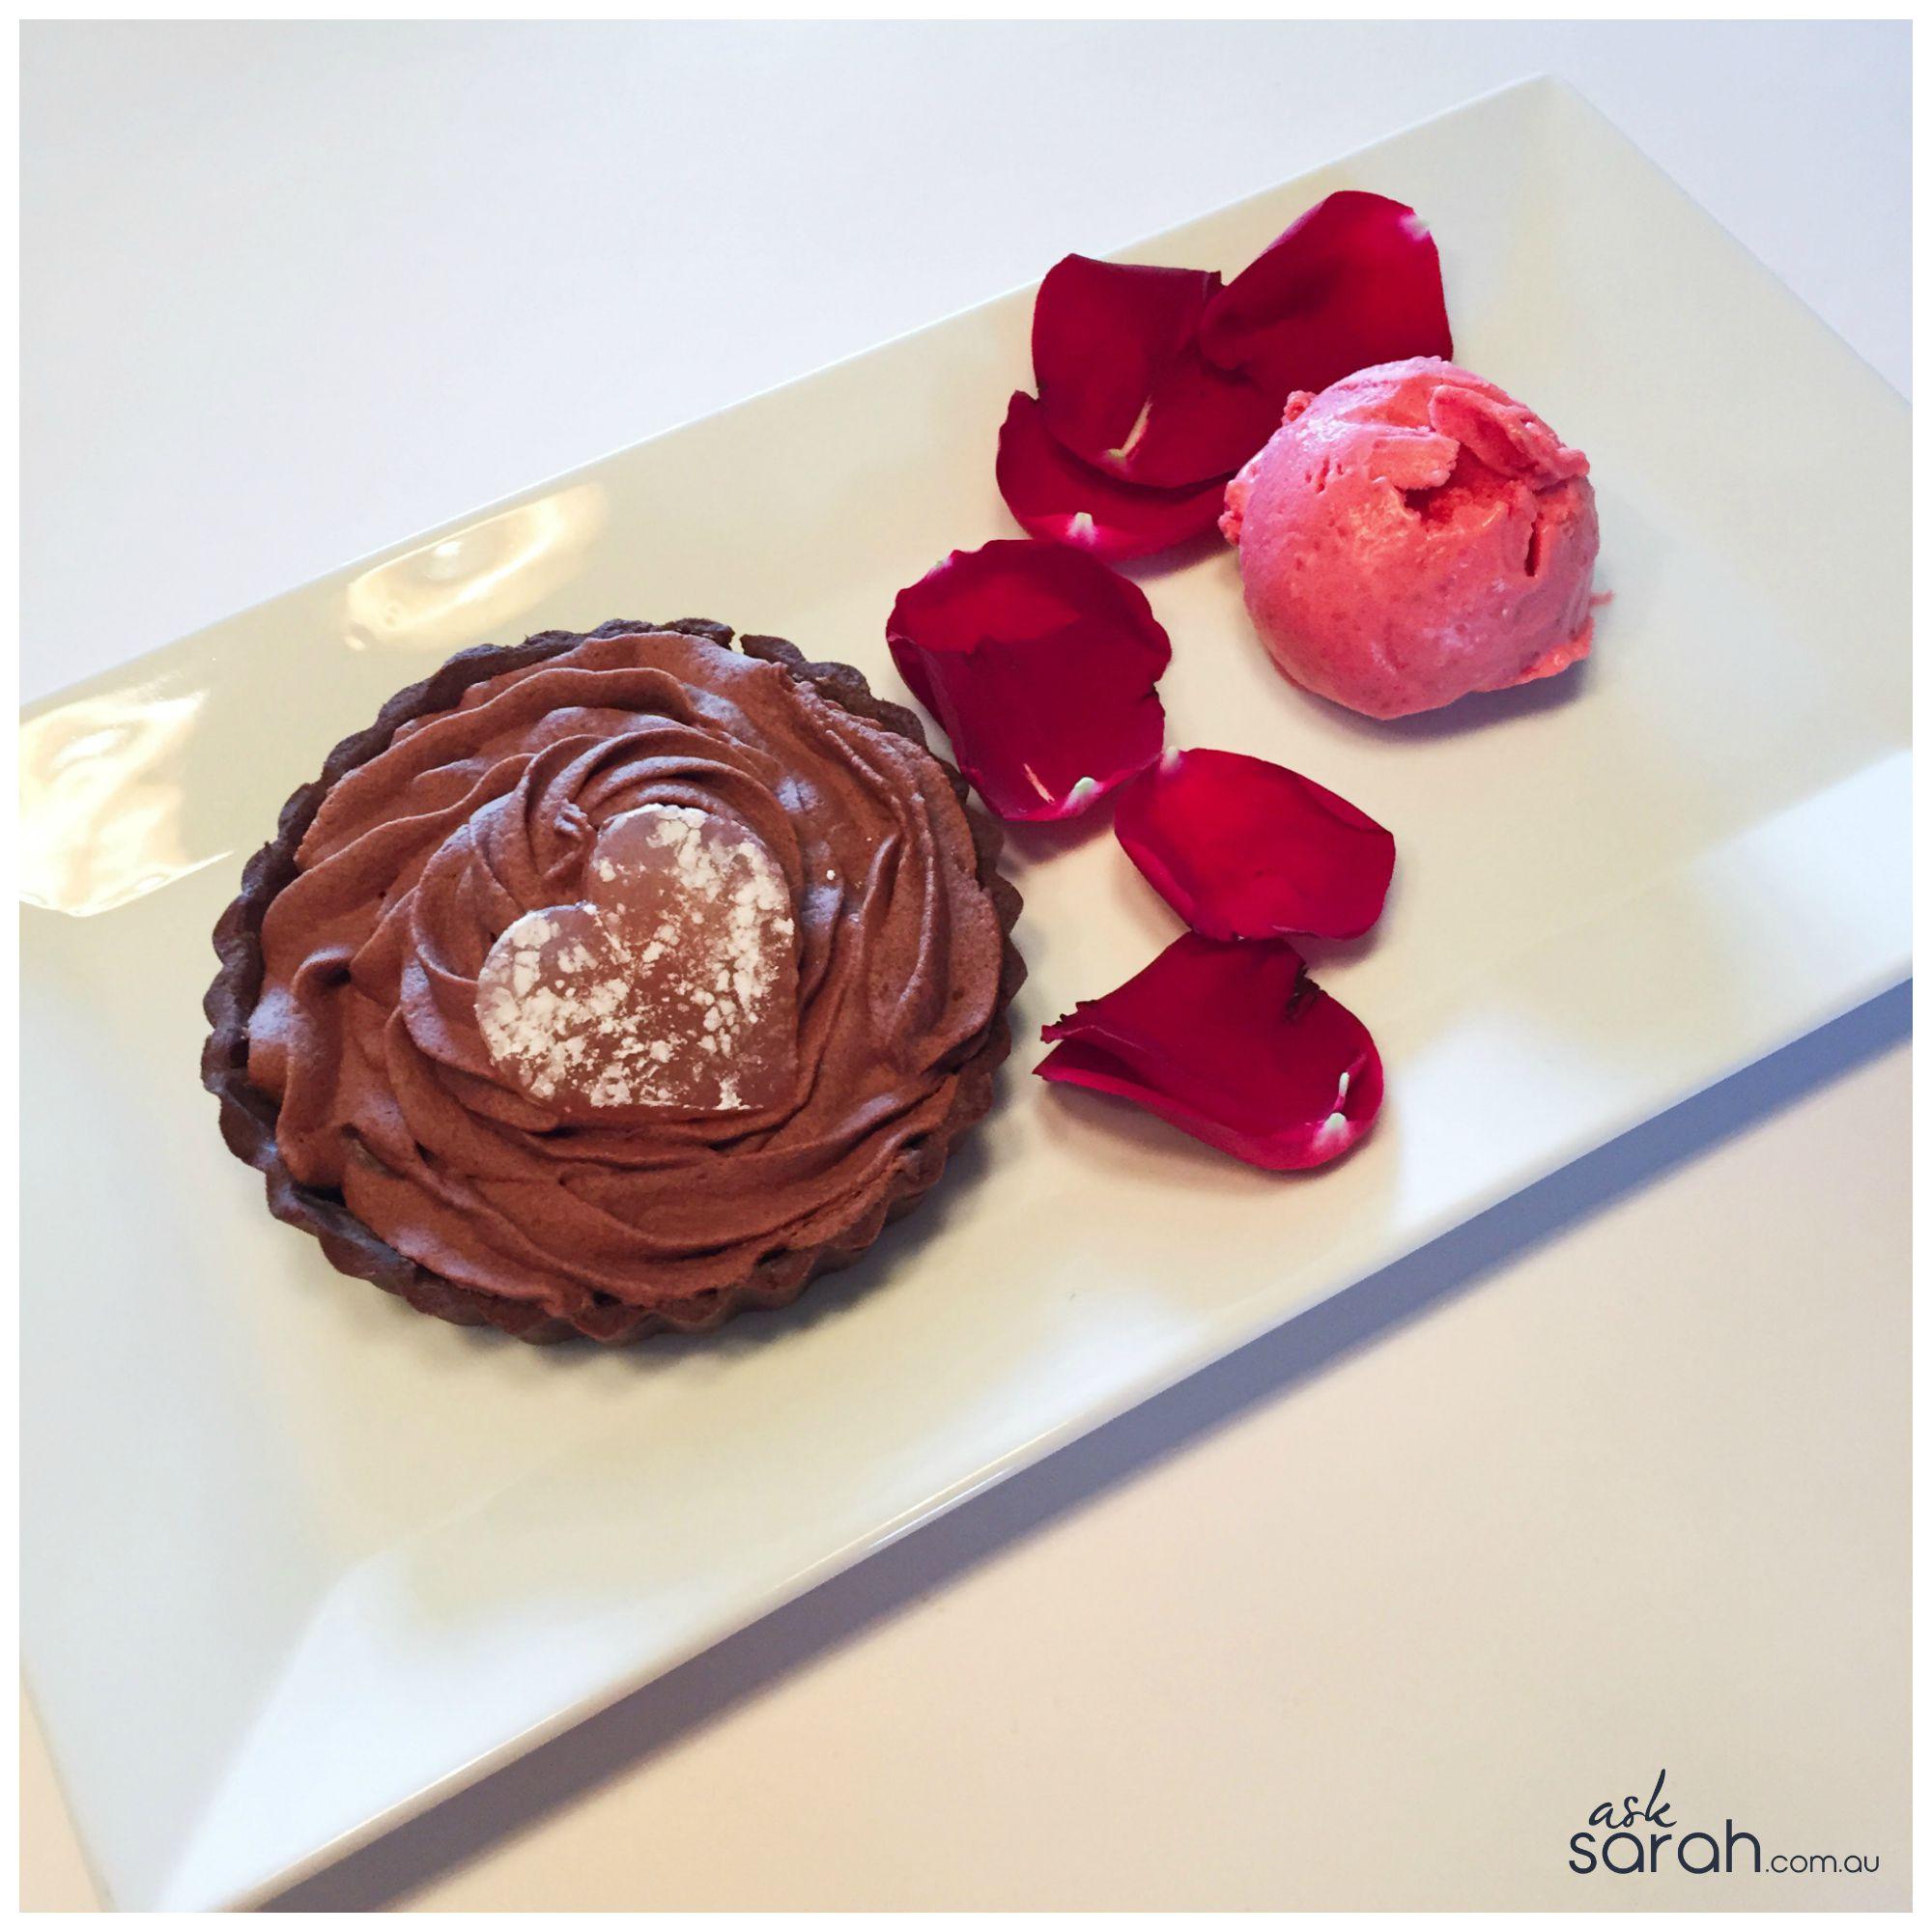 Recipe: The Five Senses Chocolate Raspberry Rose Dessert {A Perfect Fifth Anniversary Treat}